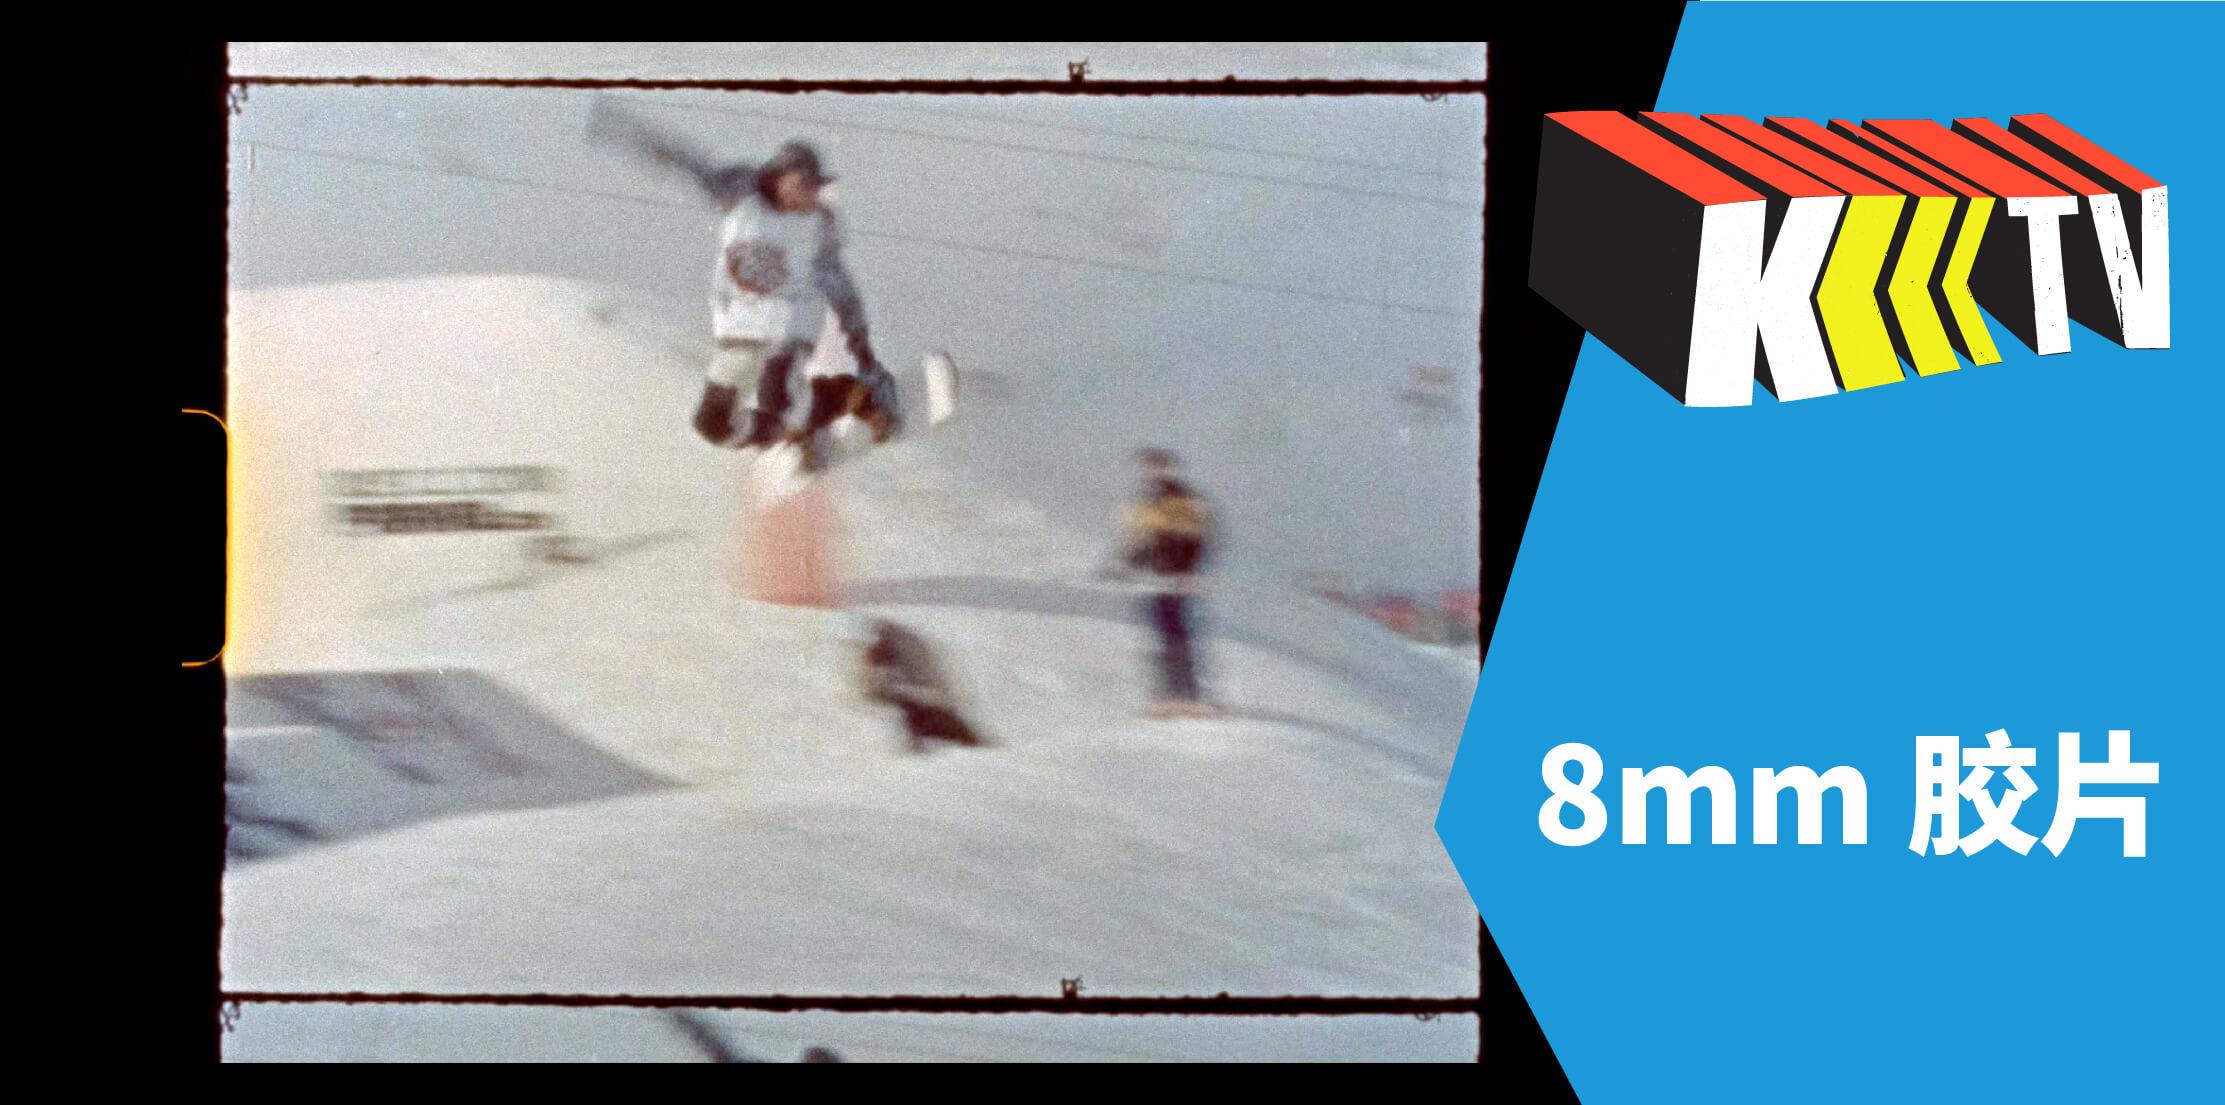 KTV – 8mm 胶片回忆 Vans Hi-Standard 单板滑雪